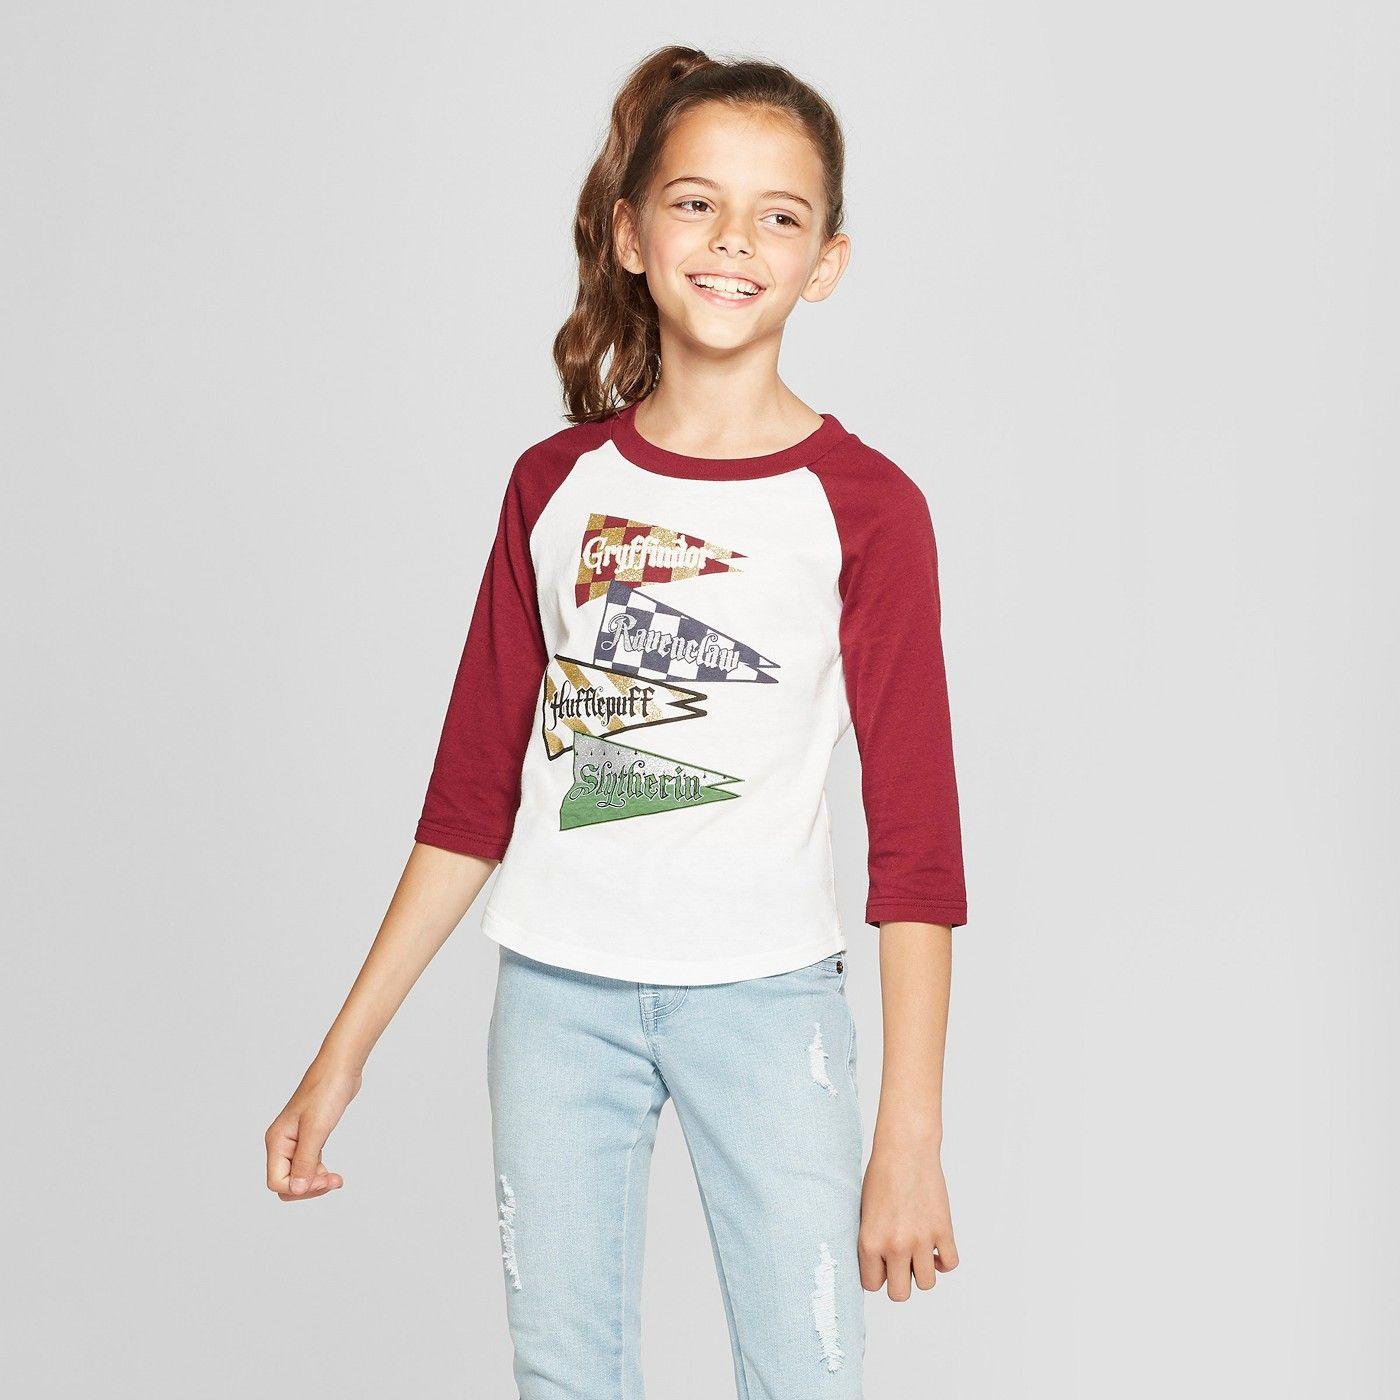 92aafb67a4740 Girls  Harry Potter 3 4 Sleeve Raglan T-Shirt - White Burgundy XL  Potter